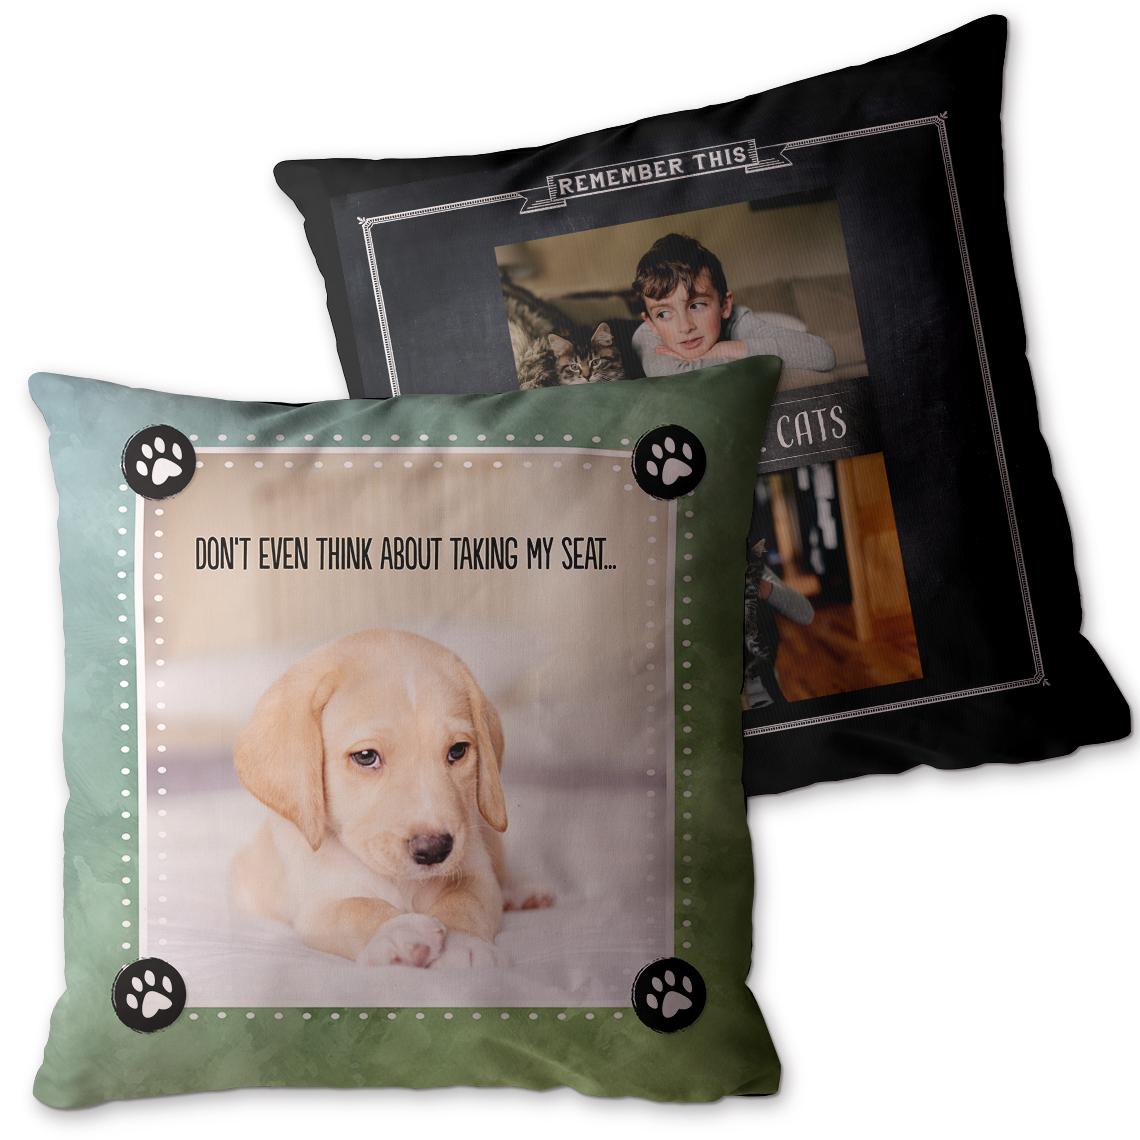 Custom pet pillows from Snapfish.com